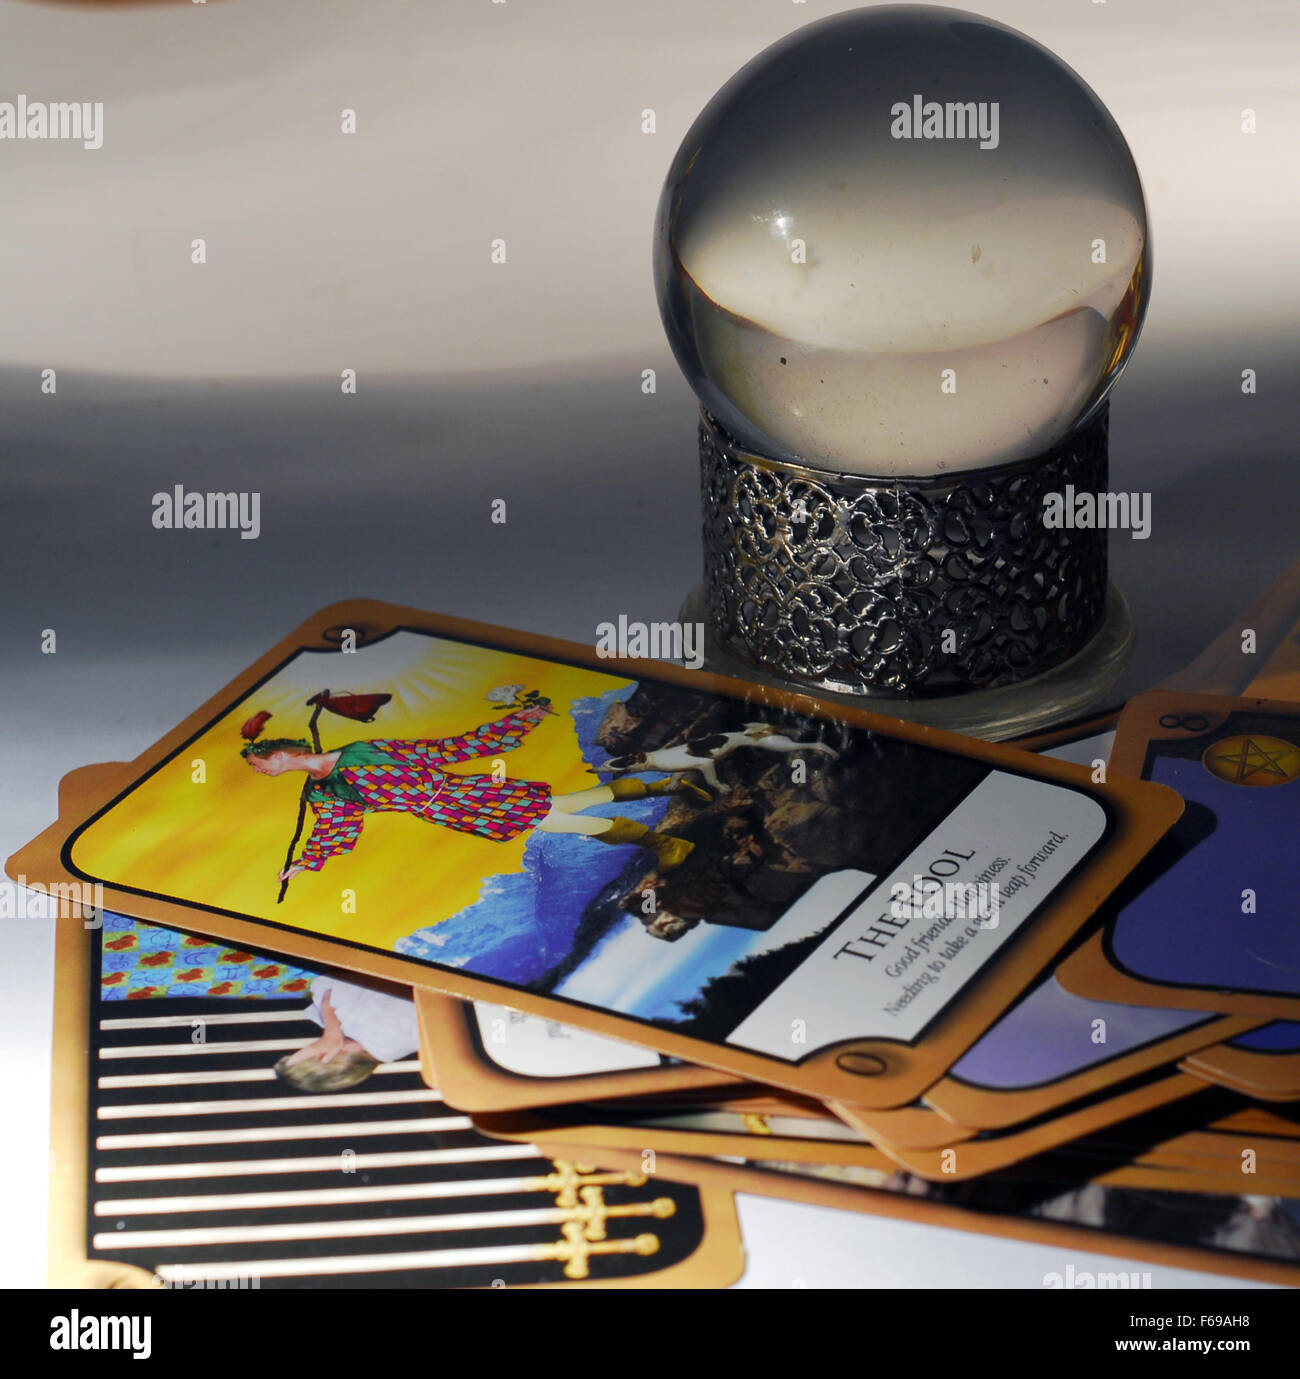 crystal ball,future,fortune teller ,gypsy,tarot,reading,fool,card, - Stock Image